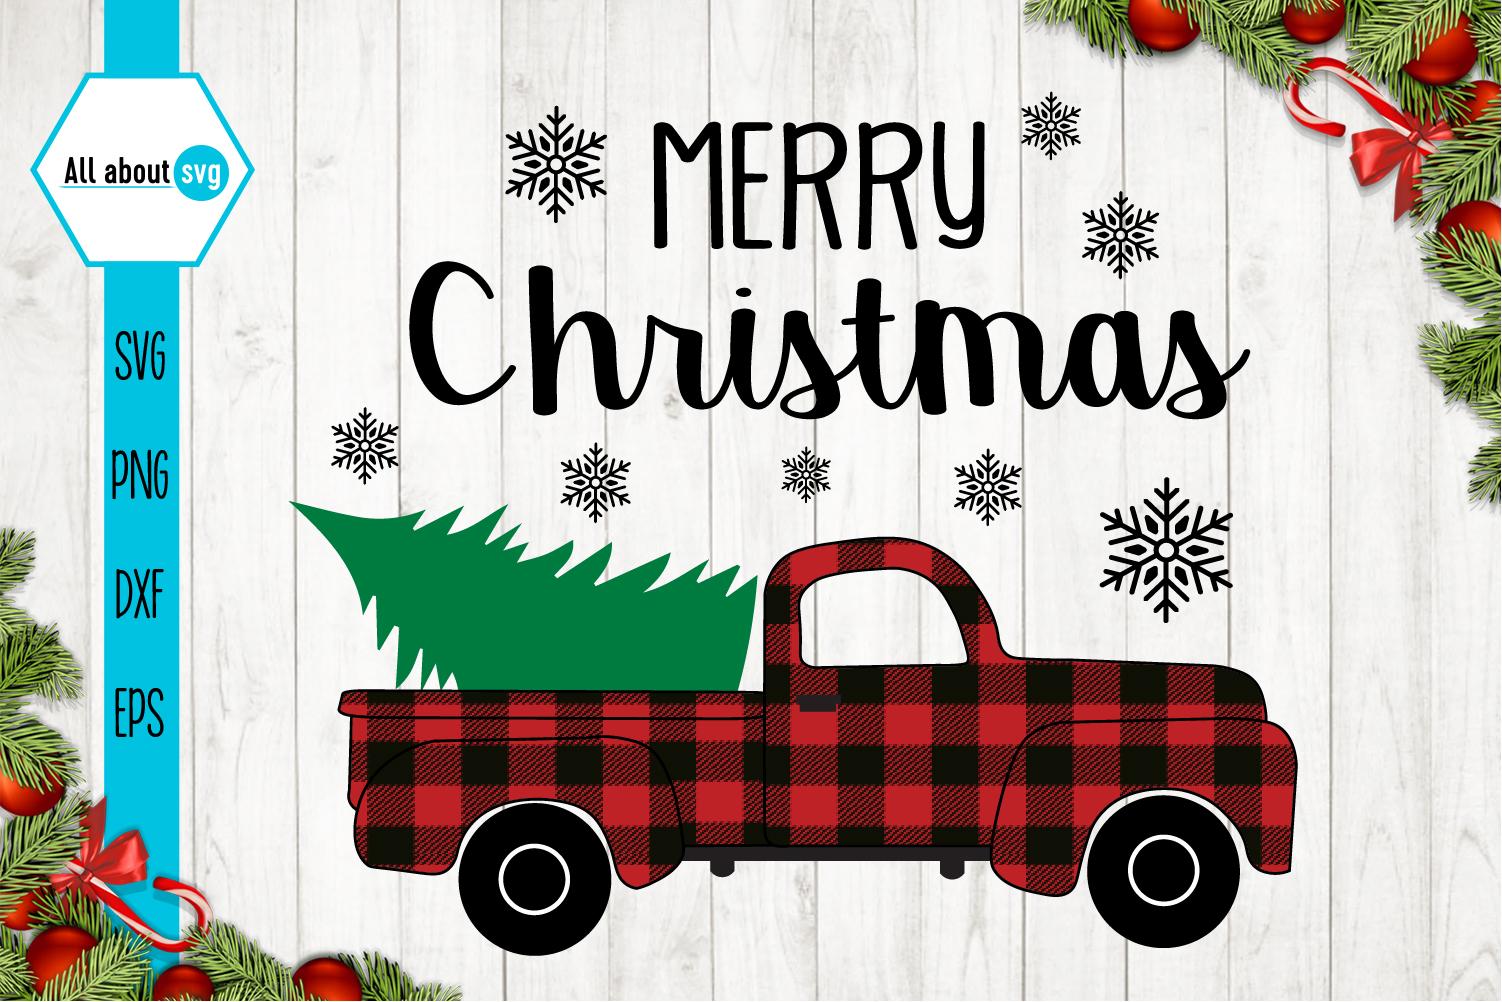 Merry Christmas Truck Svg, Buffalo Plaid Christmas Truck example image 2